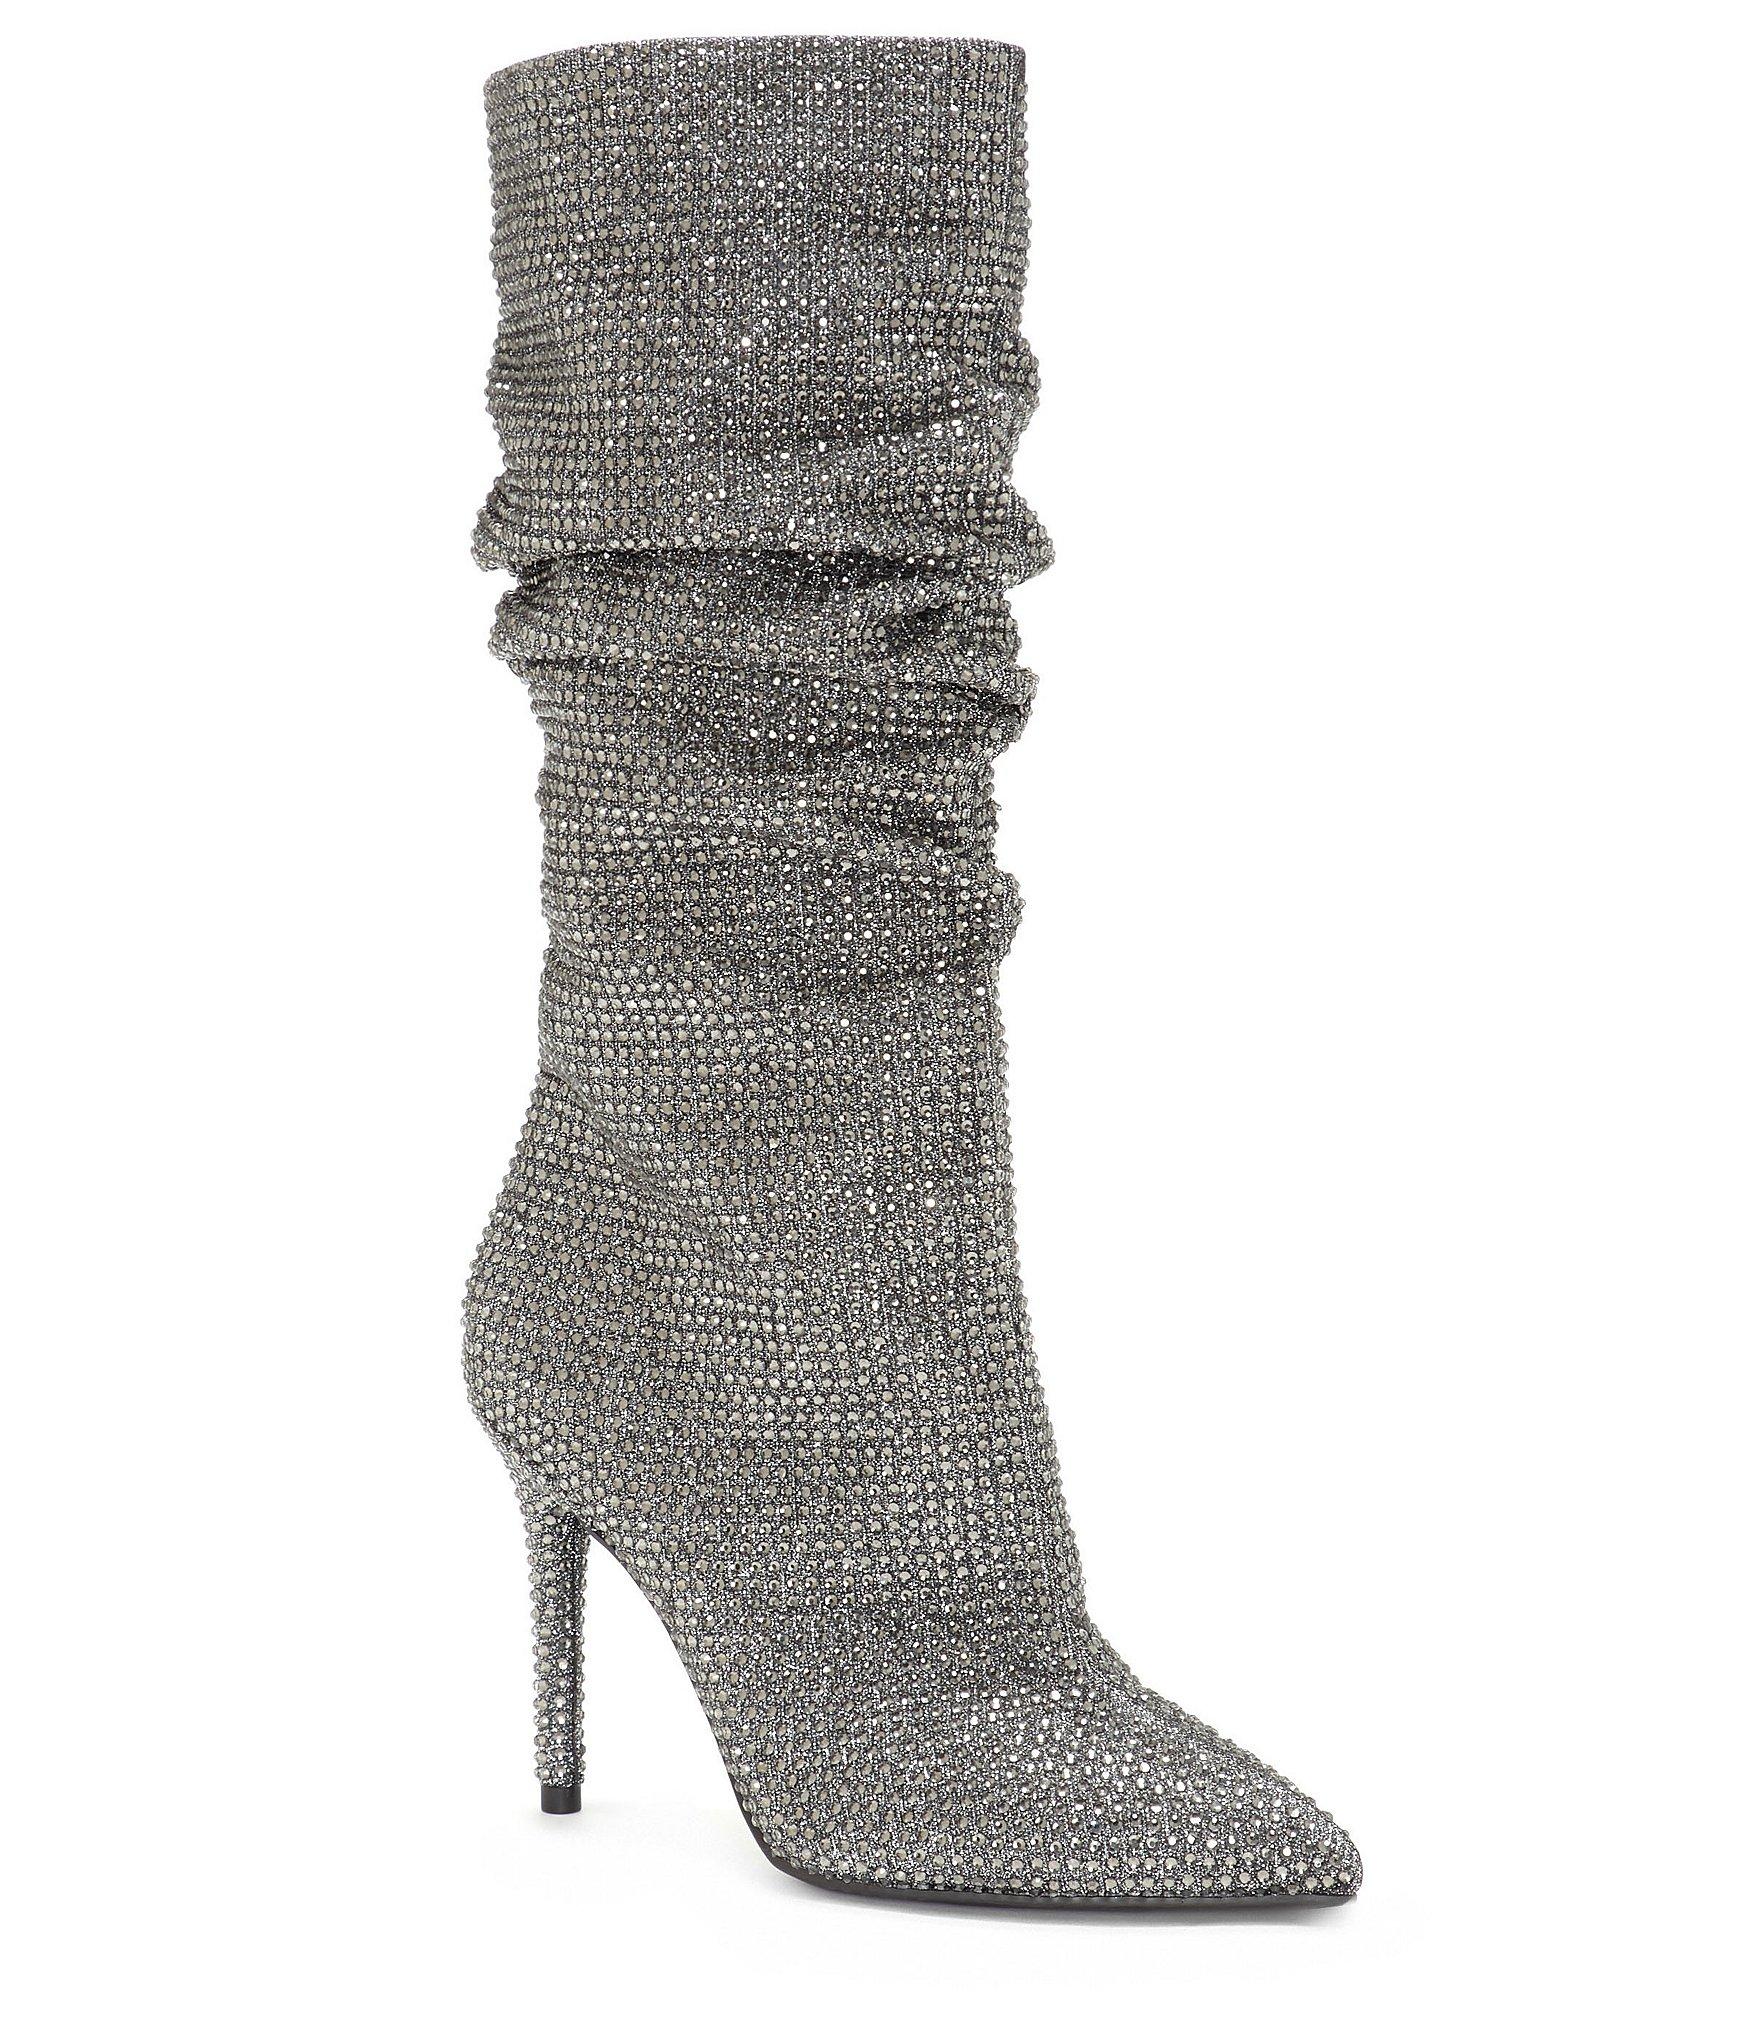 jessica simpson boots jessica simpson womenu0027s boots u0026 booties | dillards fbklkvj